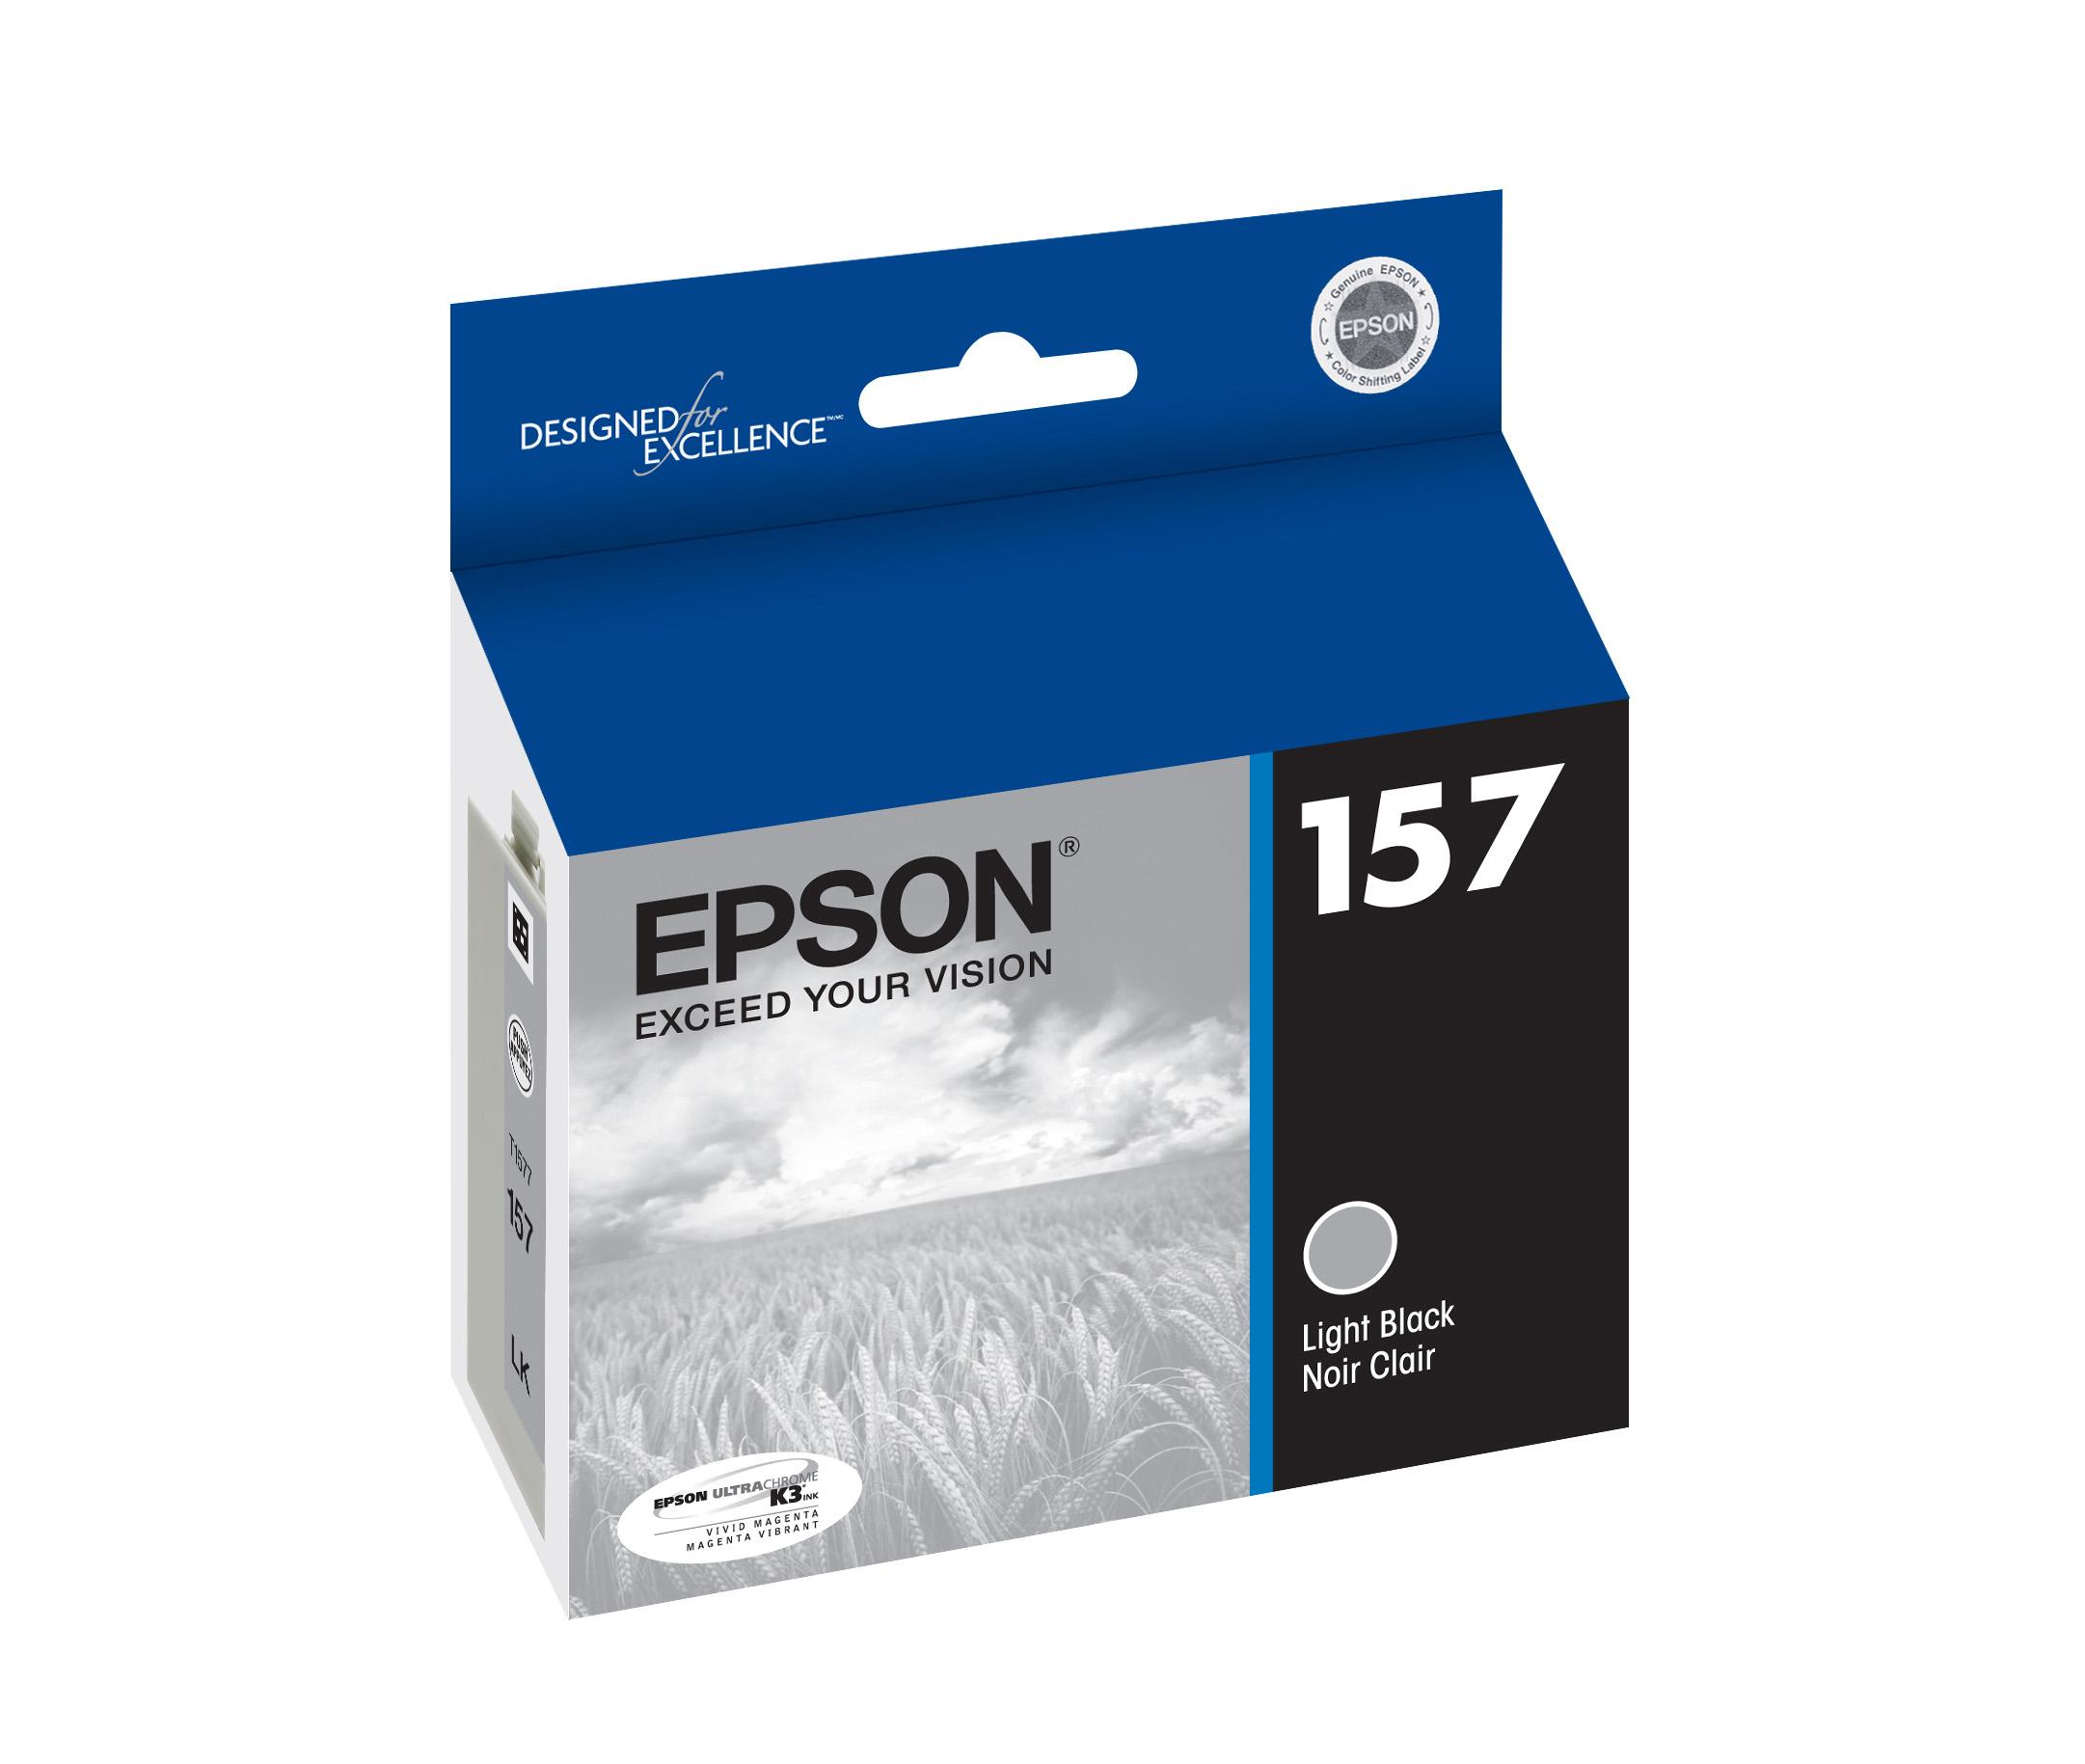 Epson R3000 Light Black Ink (T157720)